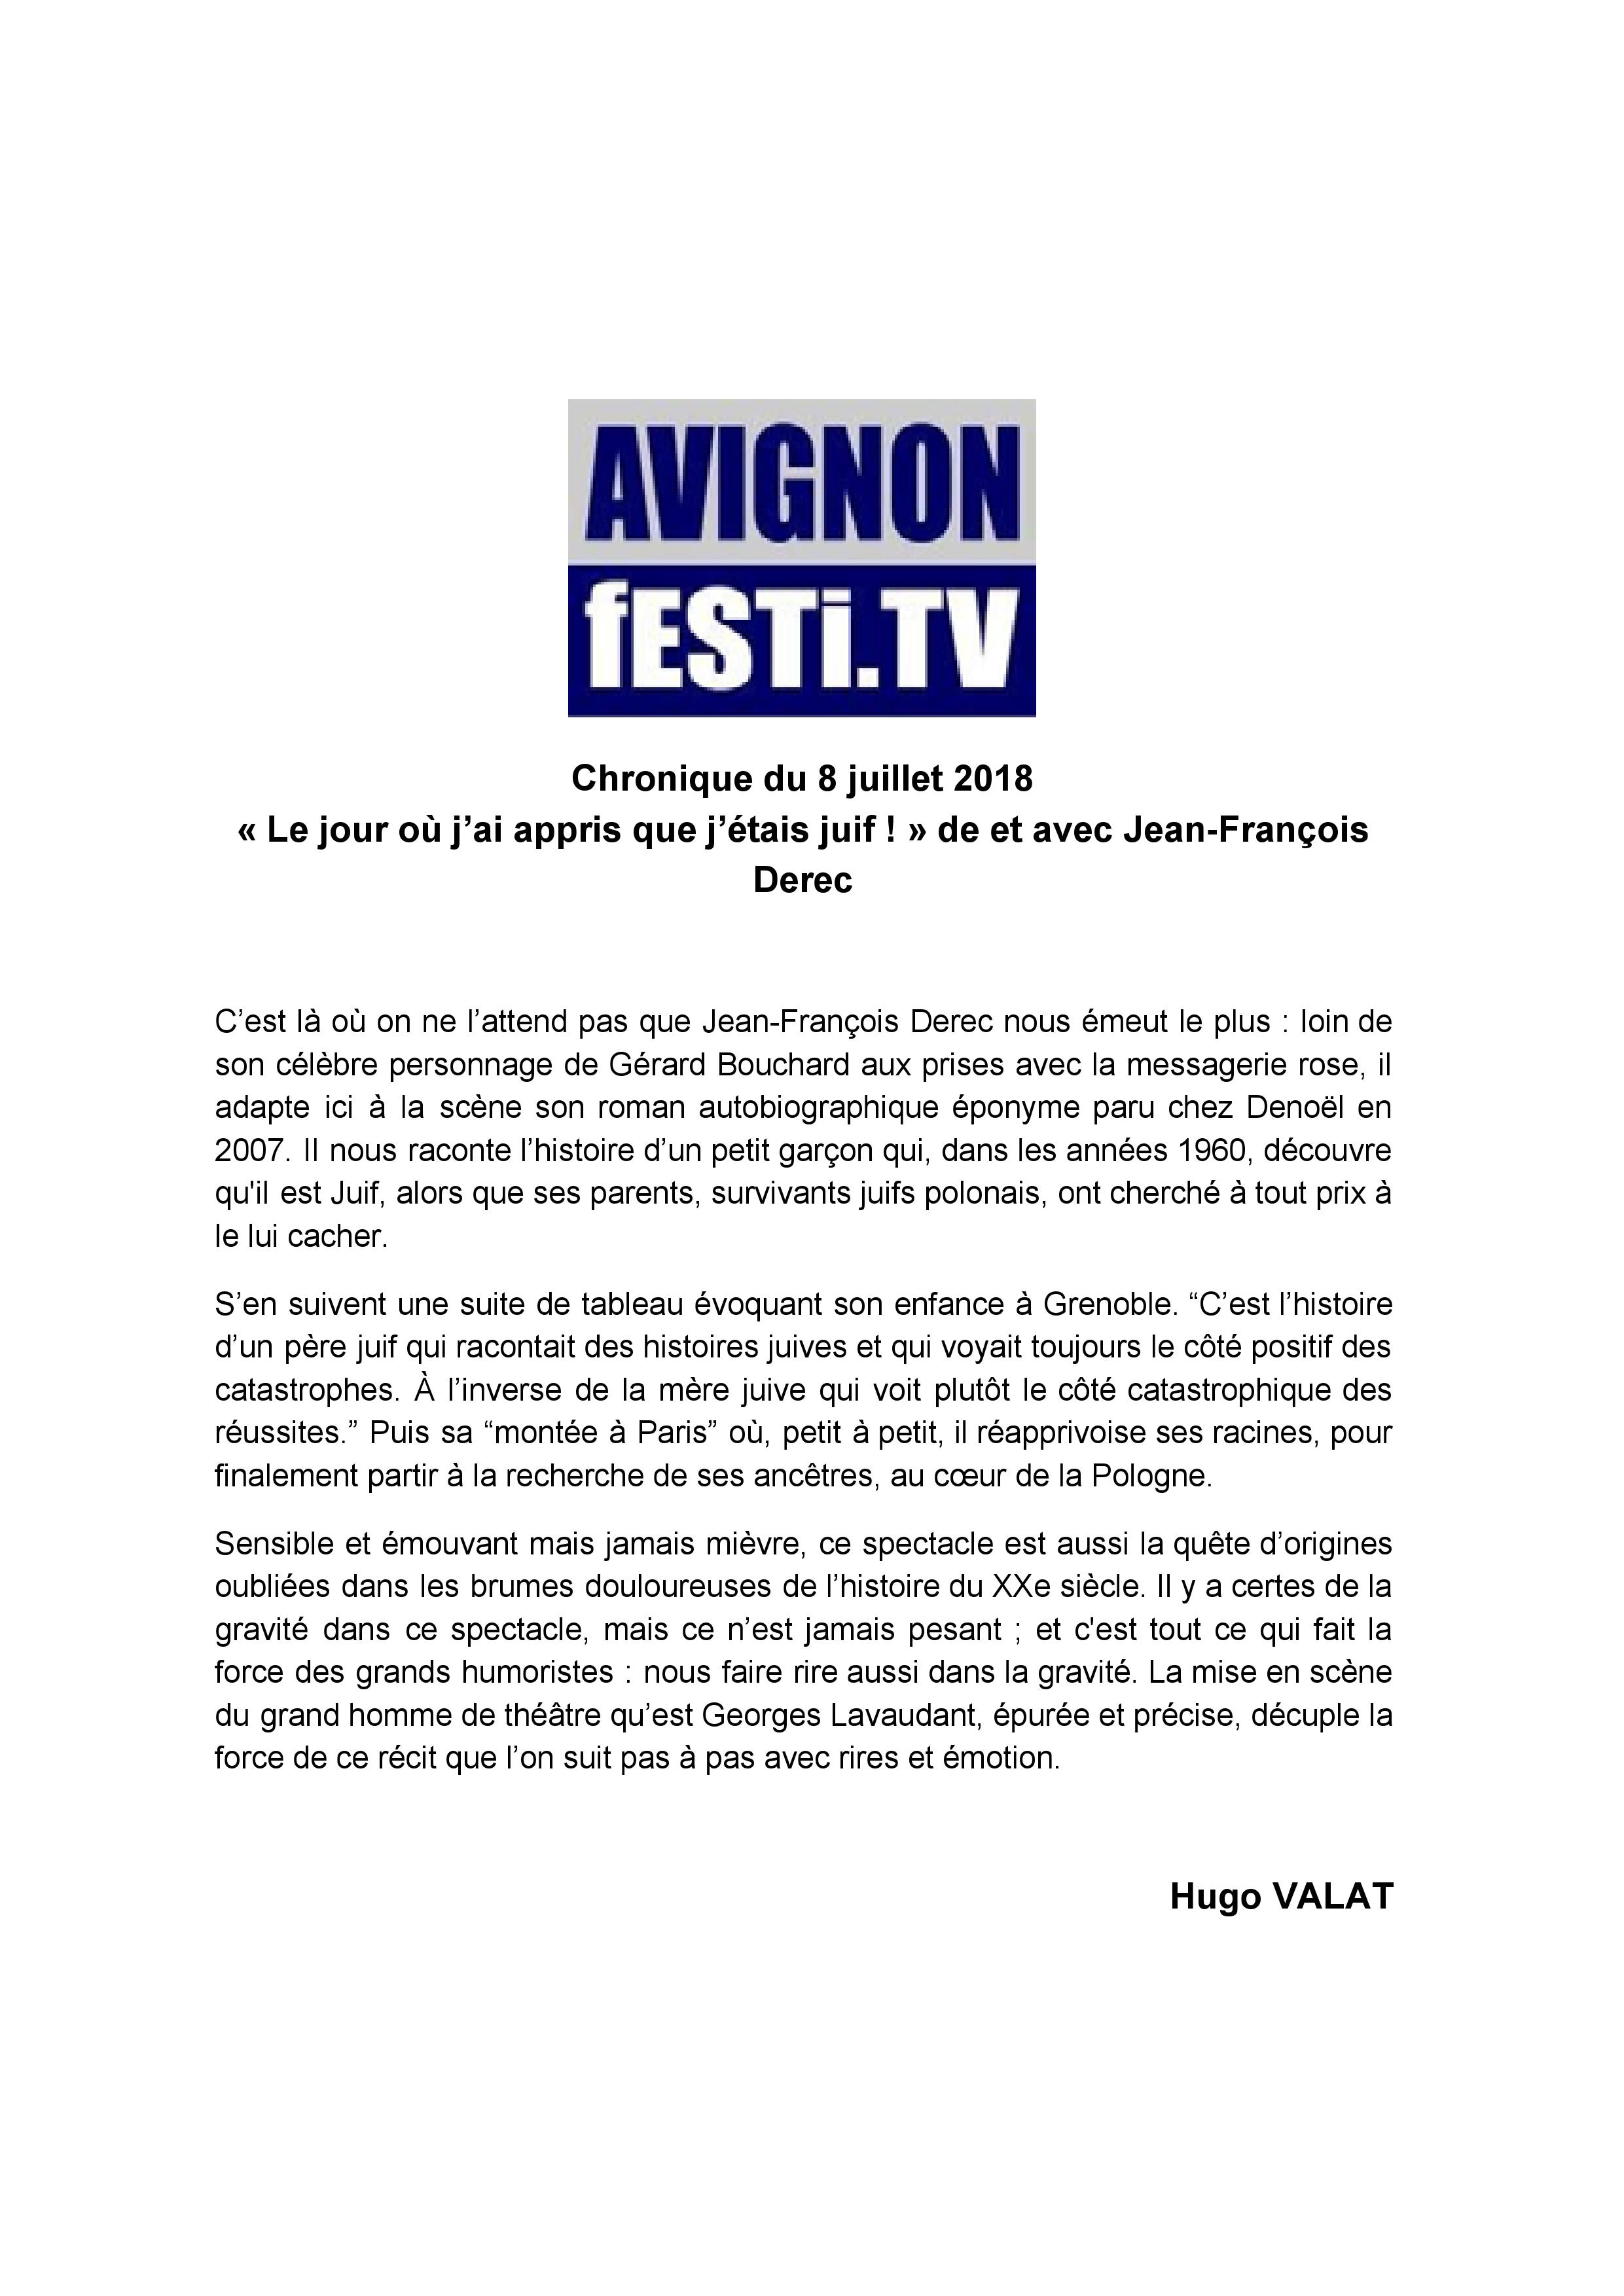 Avignon Festi TV